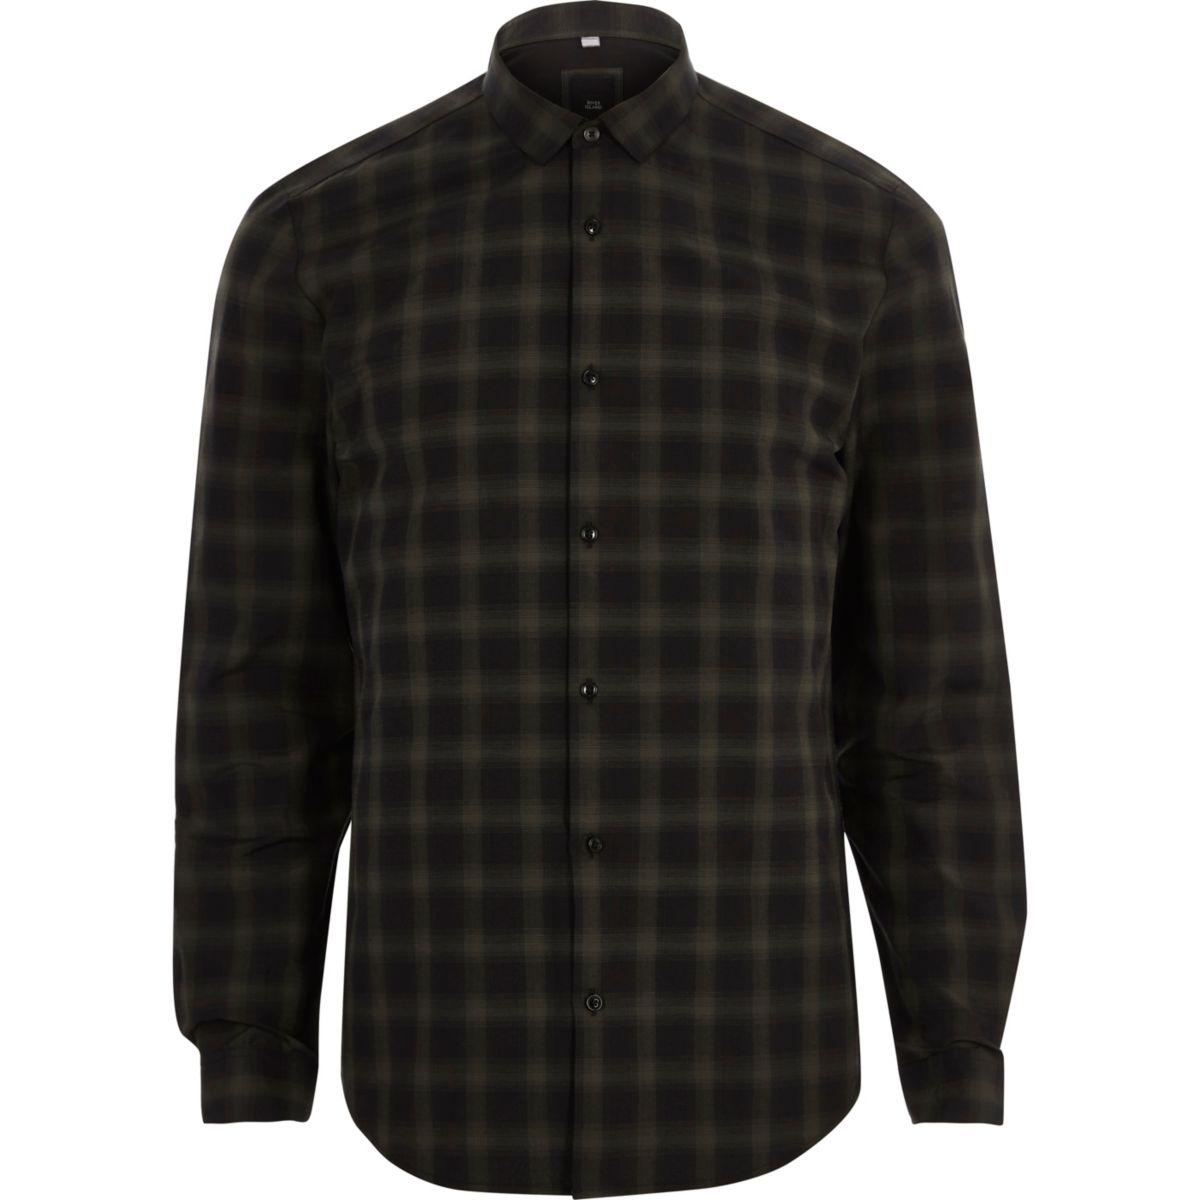 Donkergroen slim-fit overhemd met lange mouwen